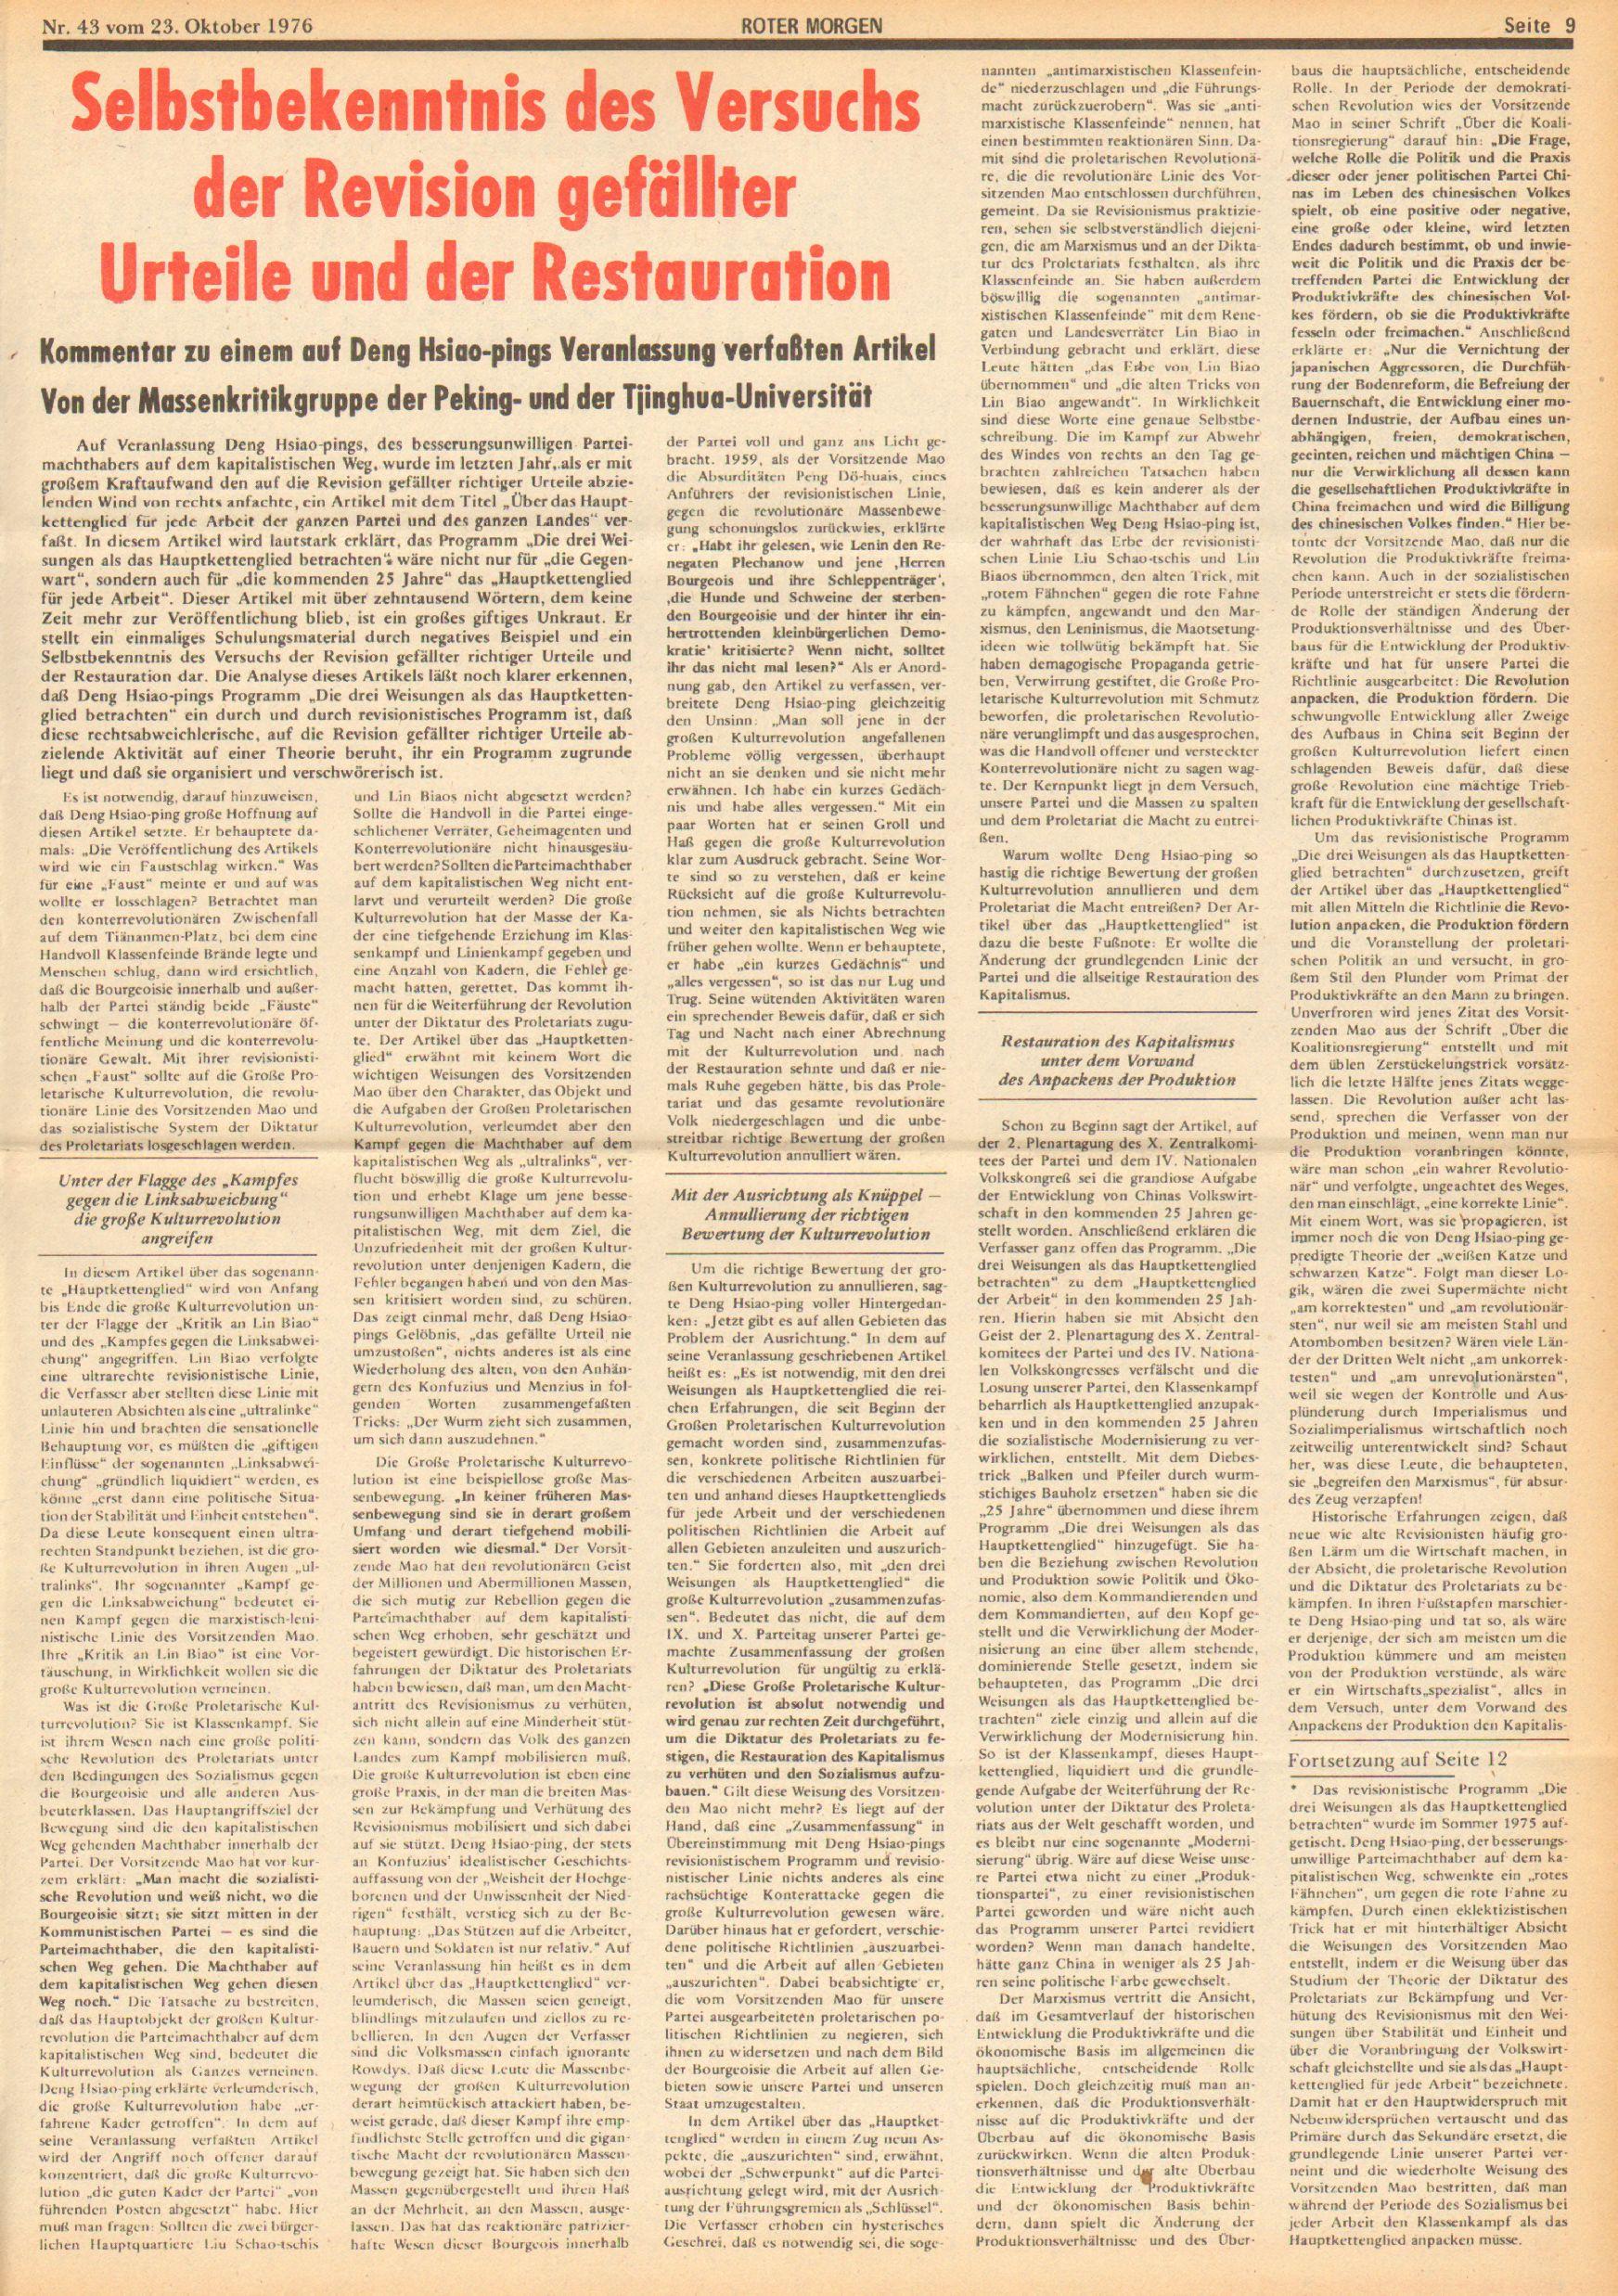 Roter Morgen, 10. Jg., 23. Oktober 1976, Nr. 43, Seite 9